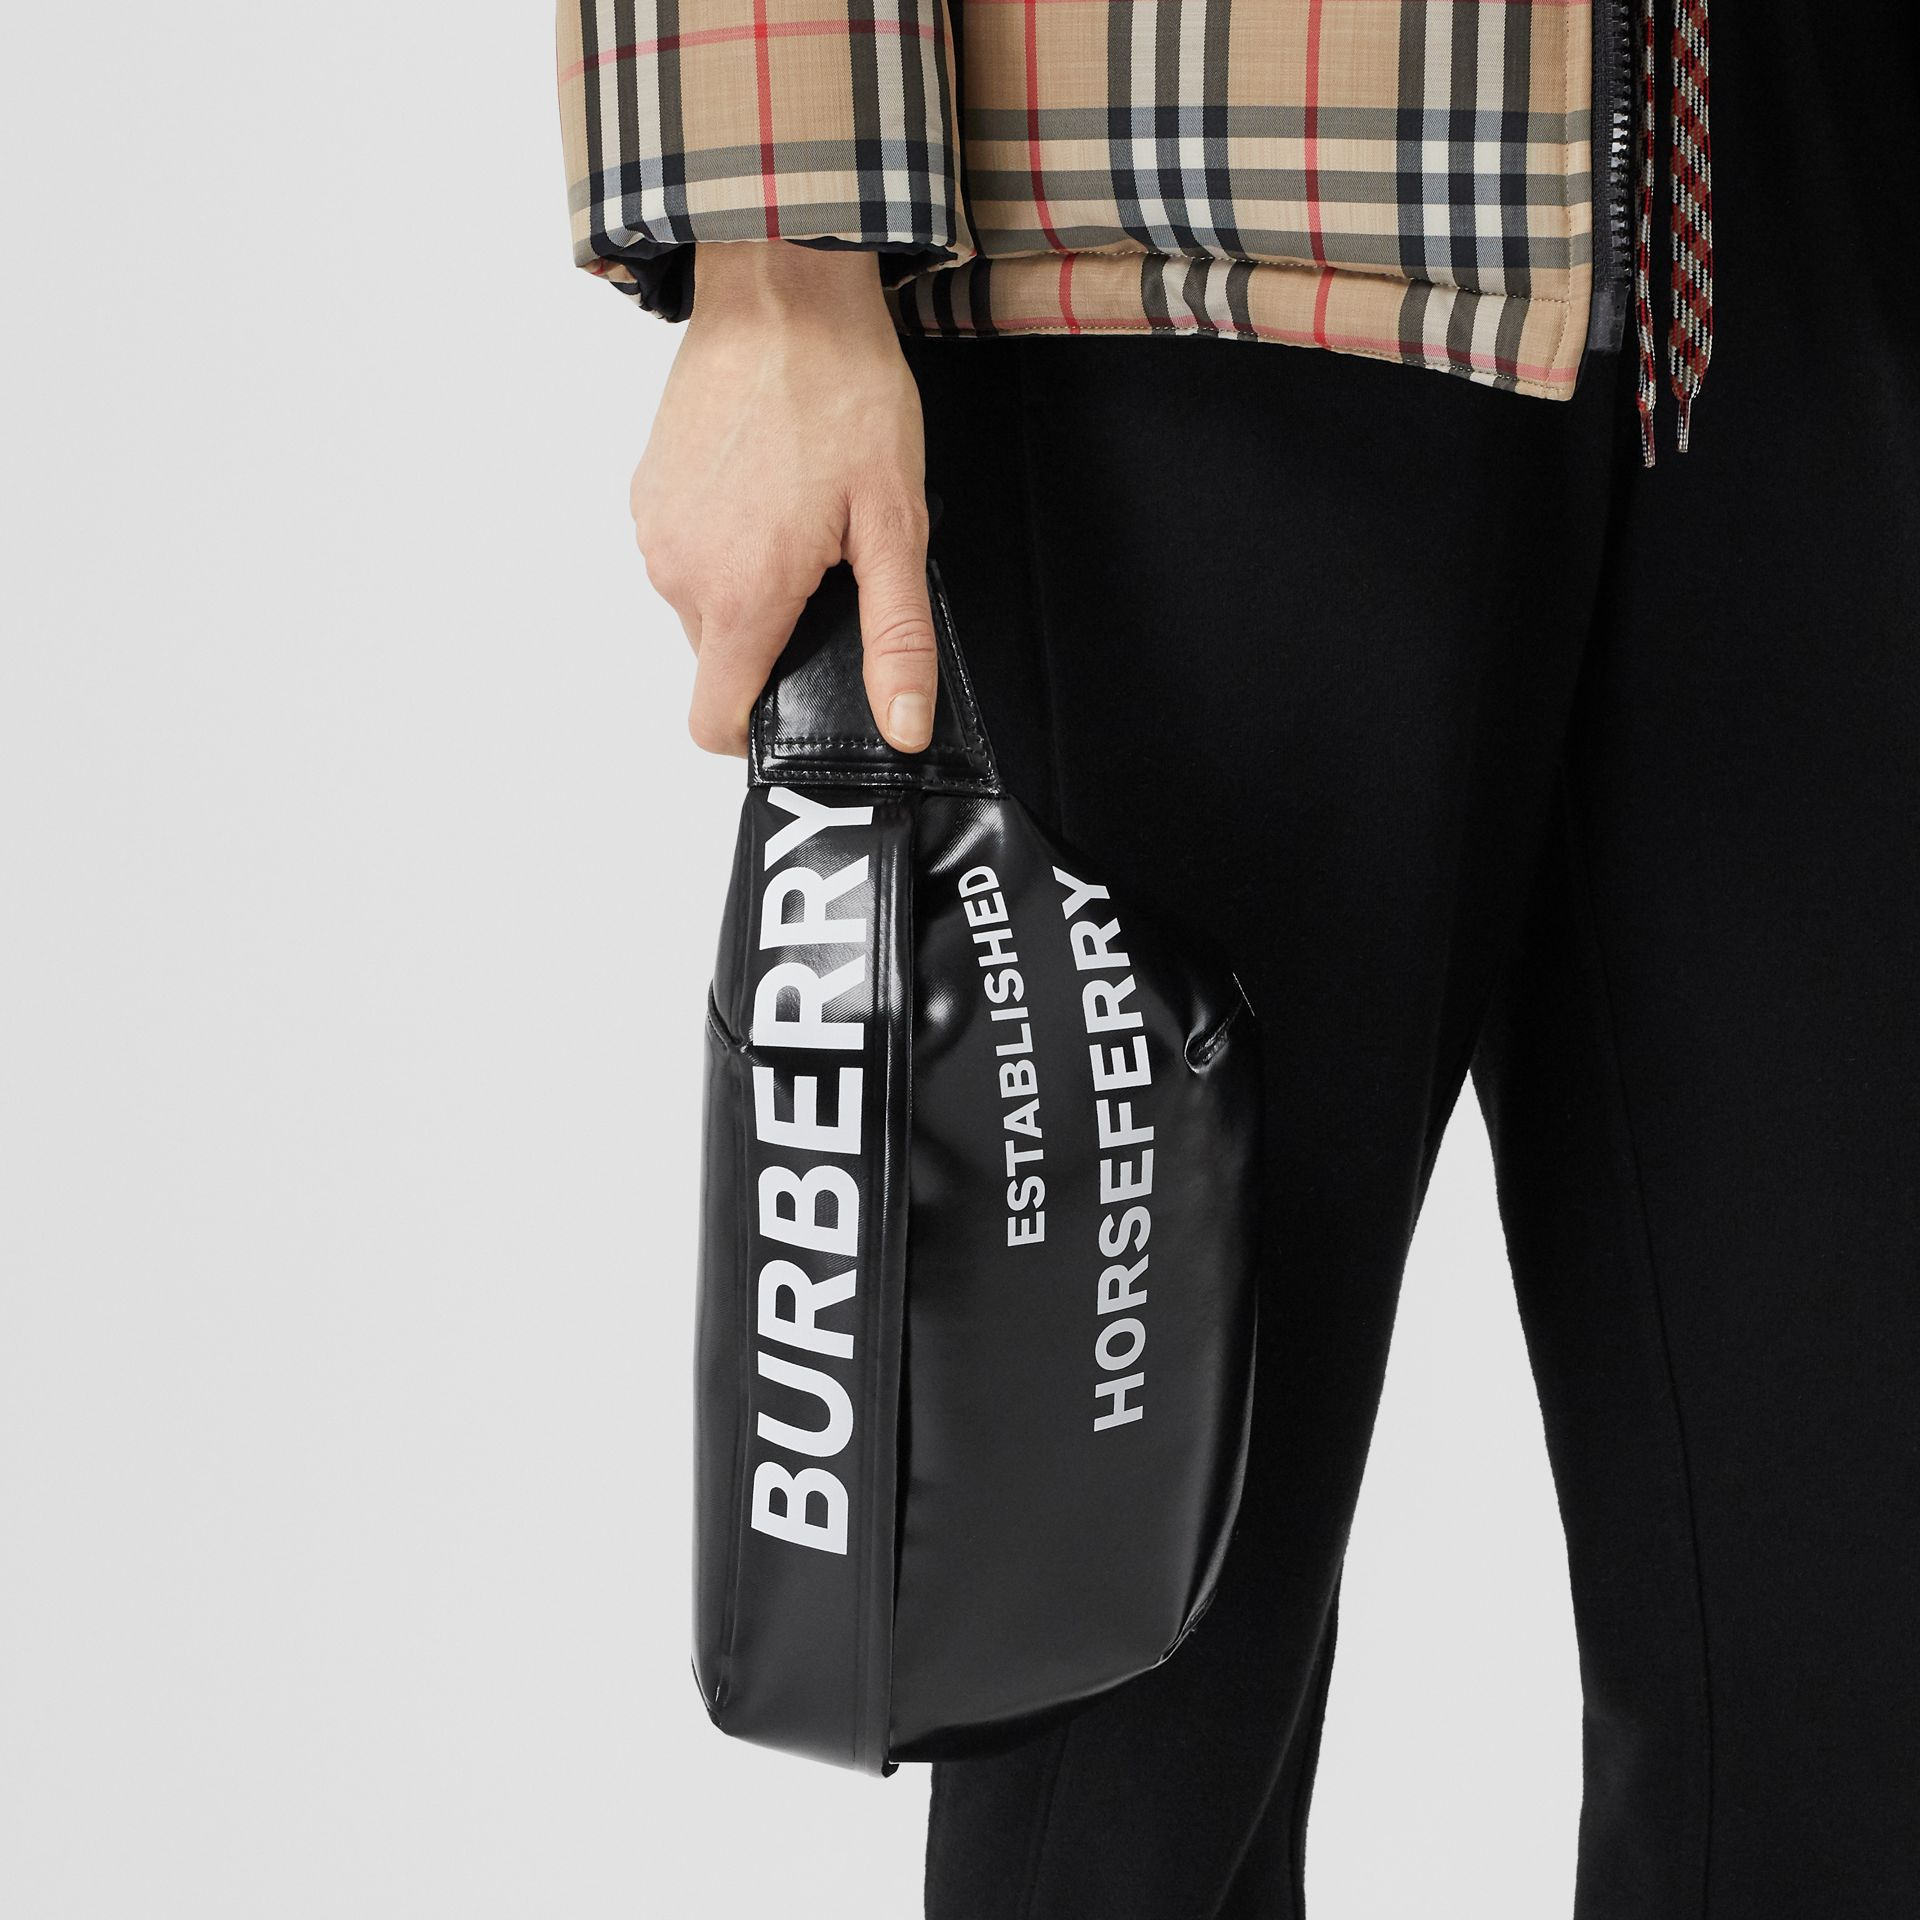 Medium Horseferry Print Bum Bag in Black | Burberry United Kingdom - gallery image 2